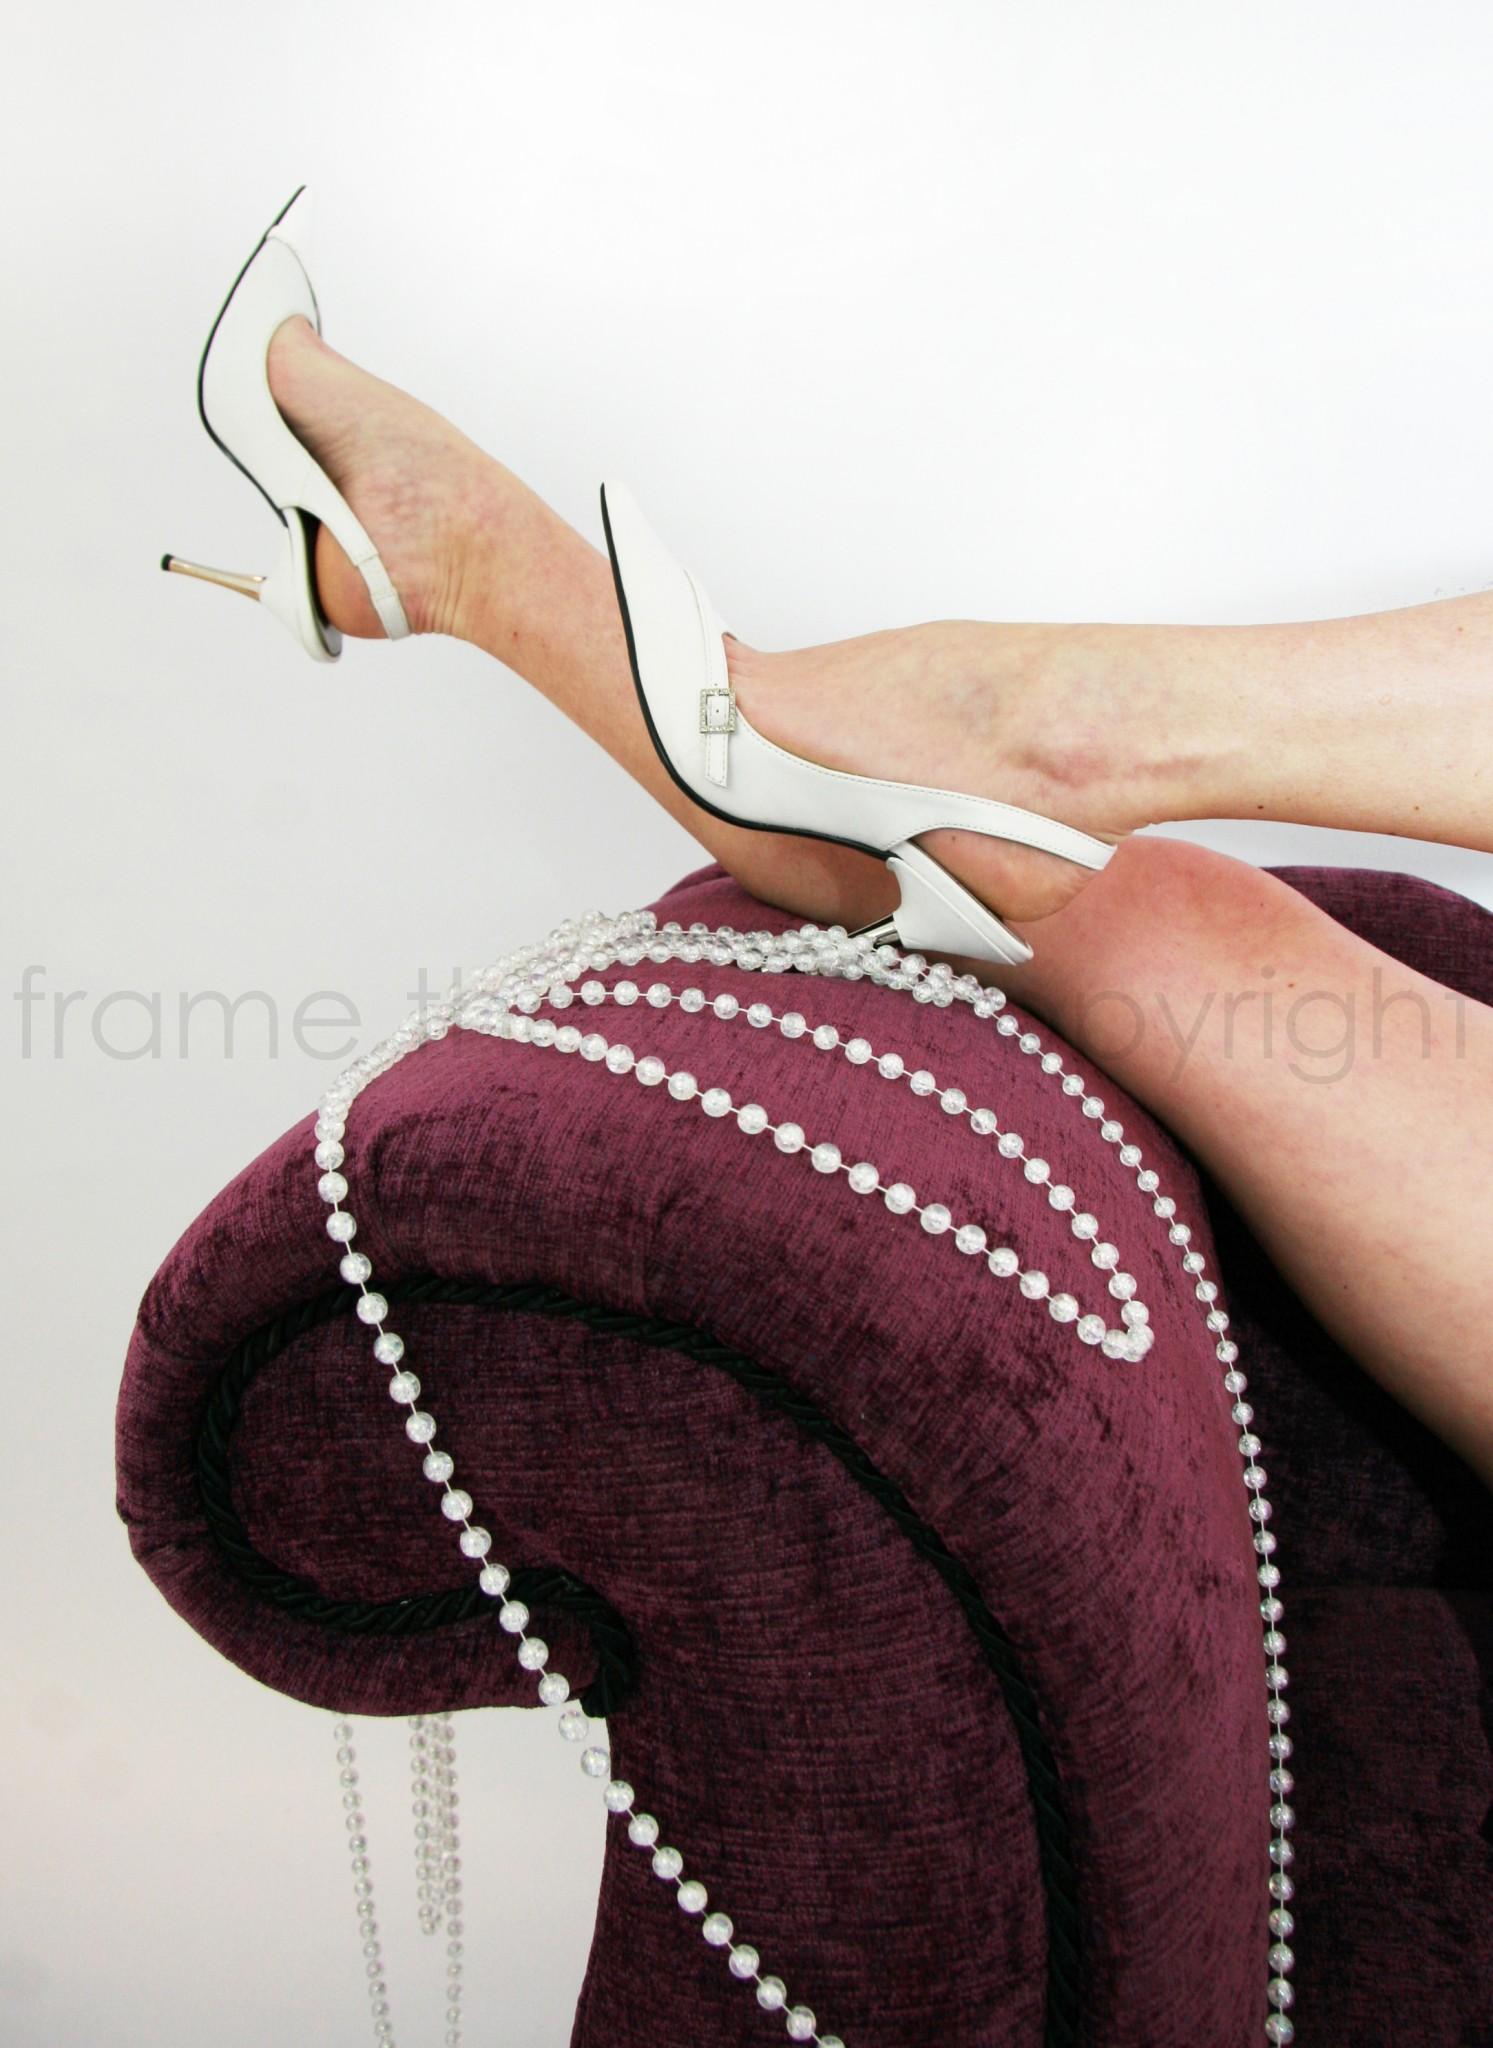 g cropped boudoir 3